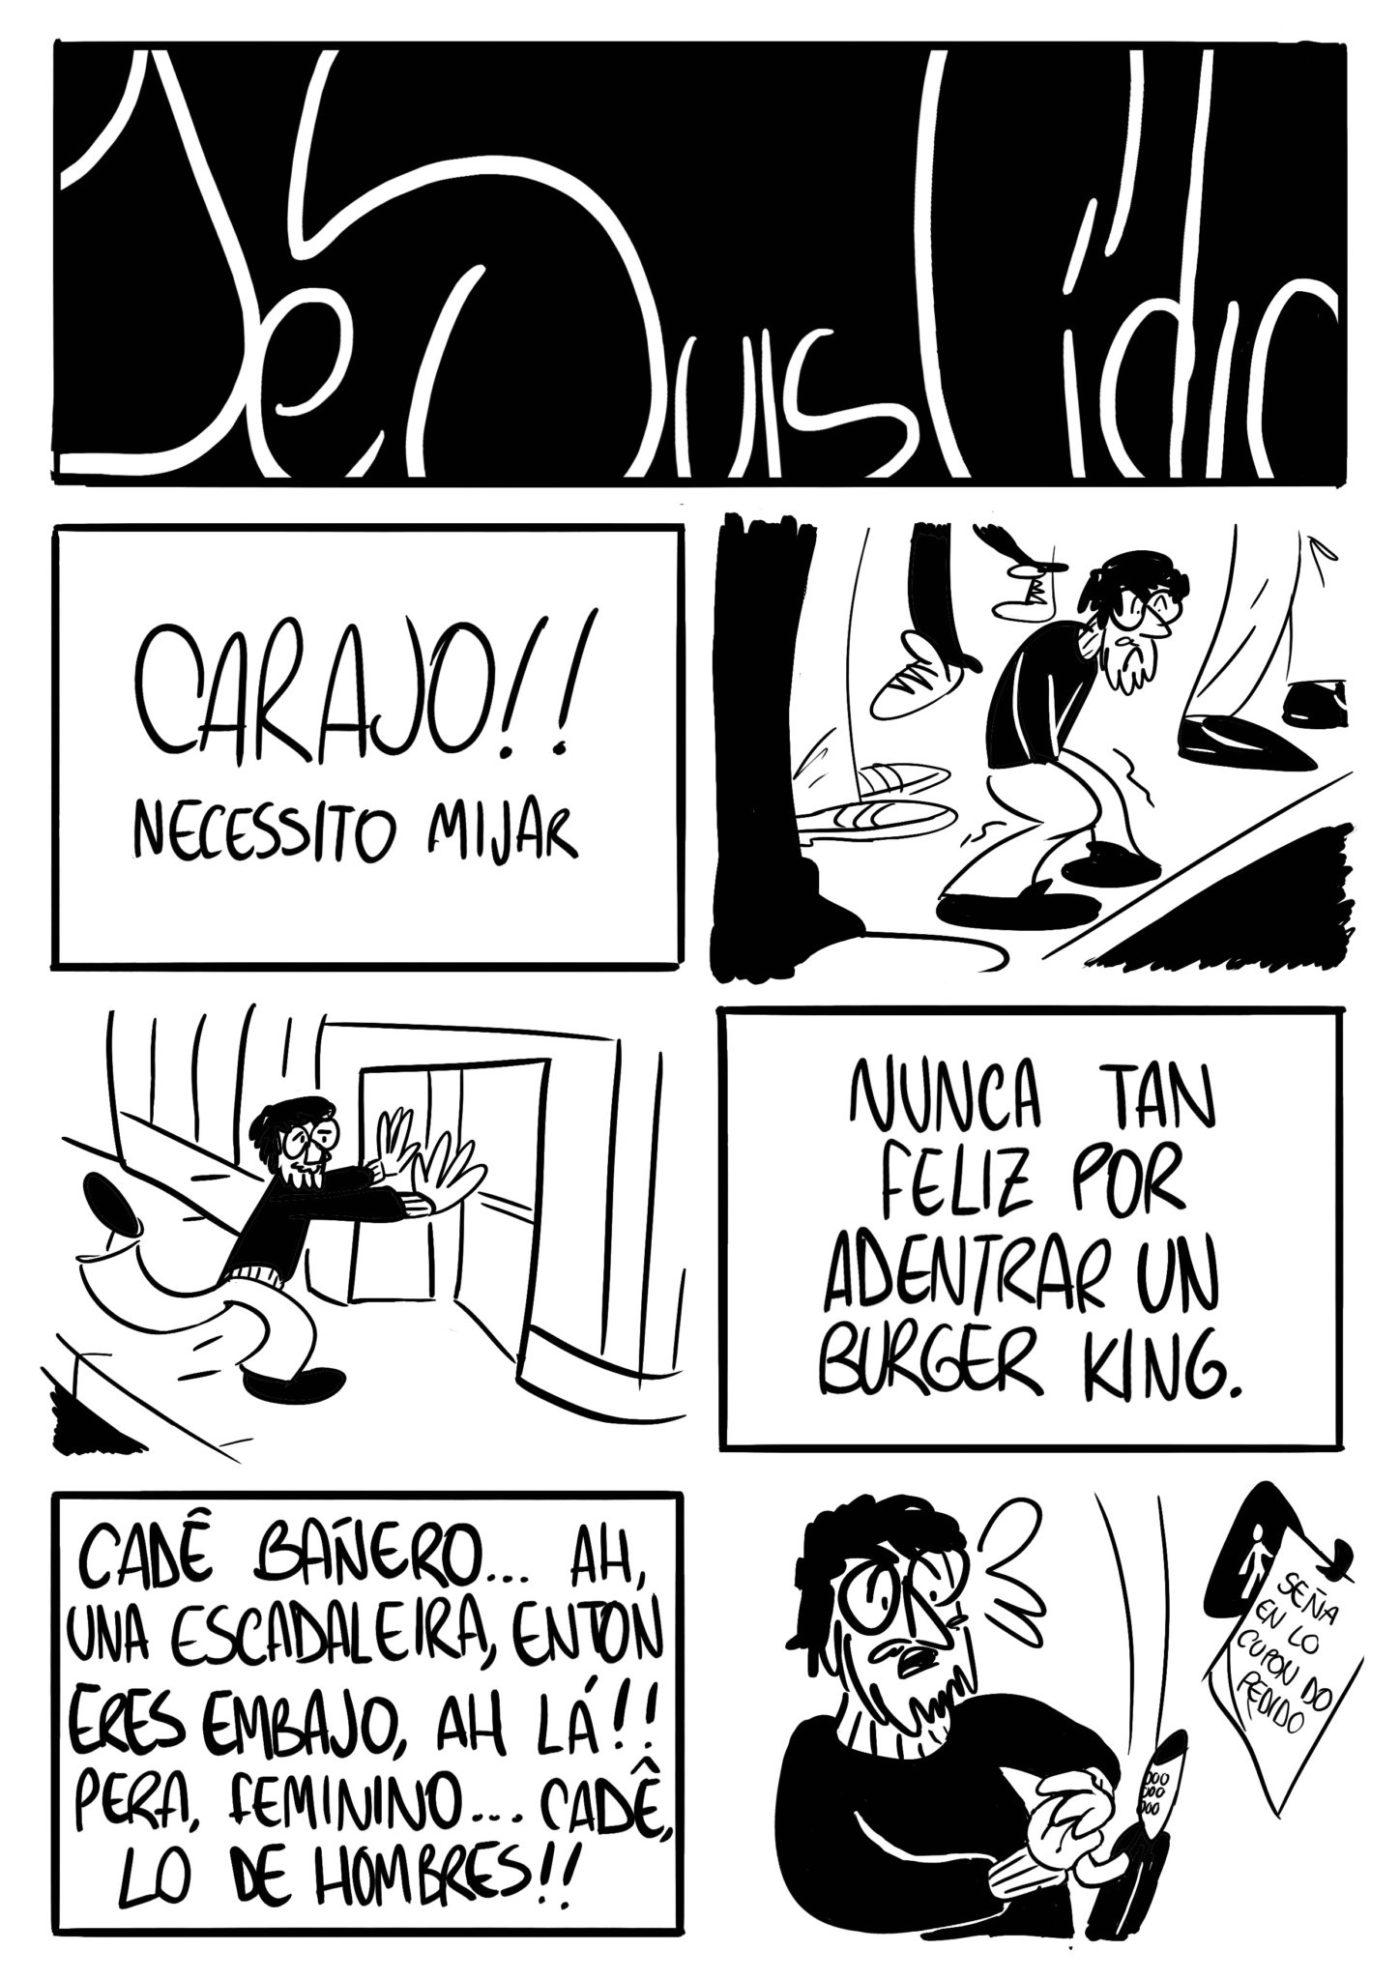 Je Suis Cídio #7, por João B. Godoi